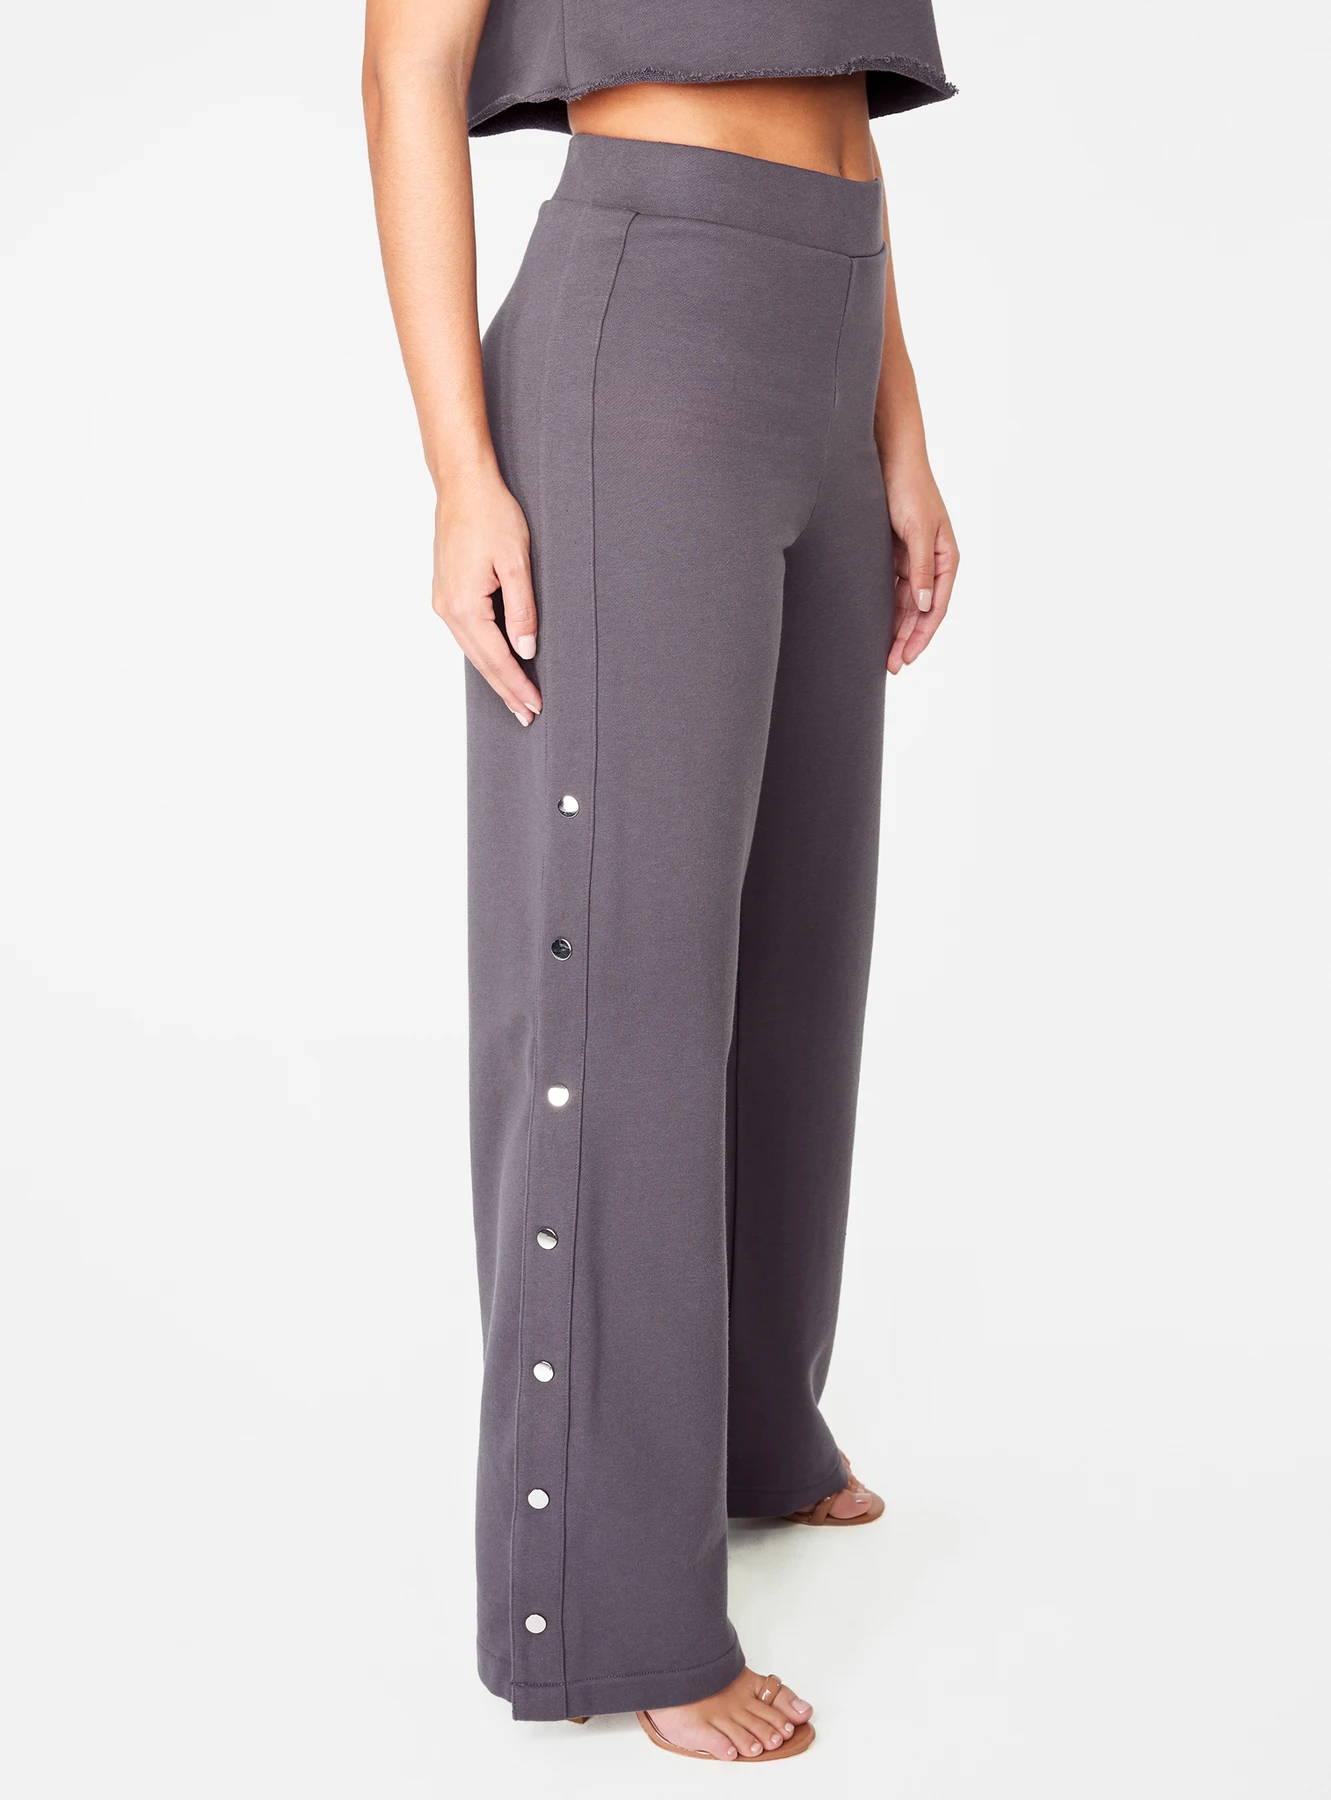 Dark Grey High Waisted Knit Side Snap Pant